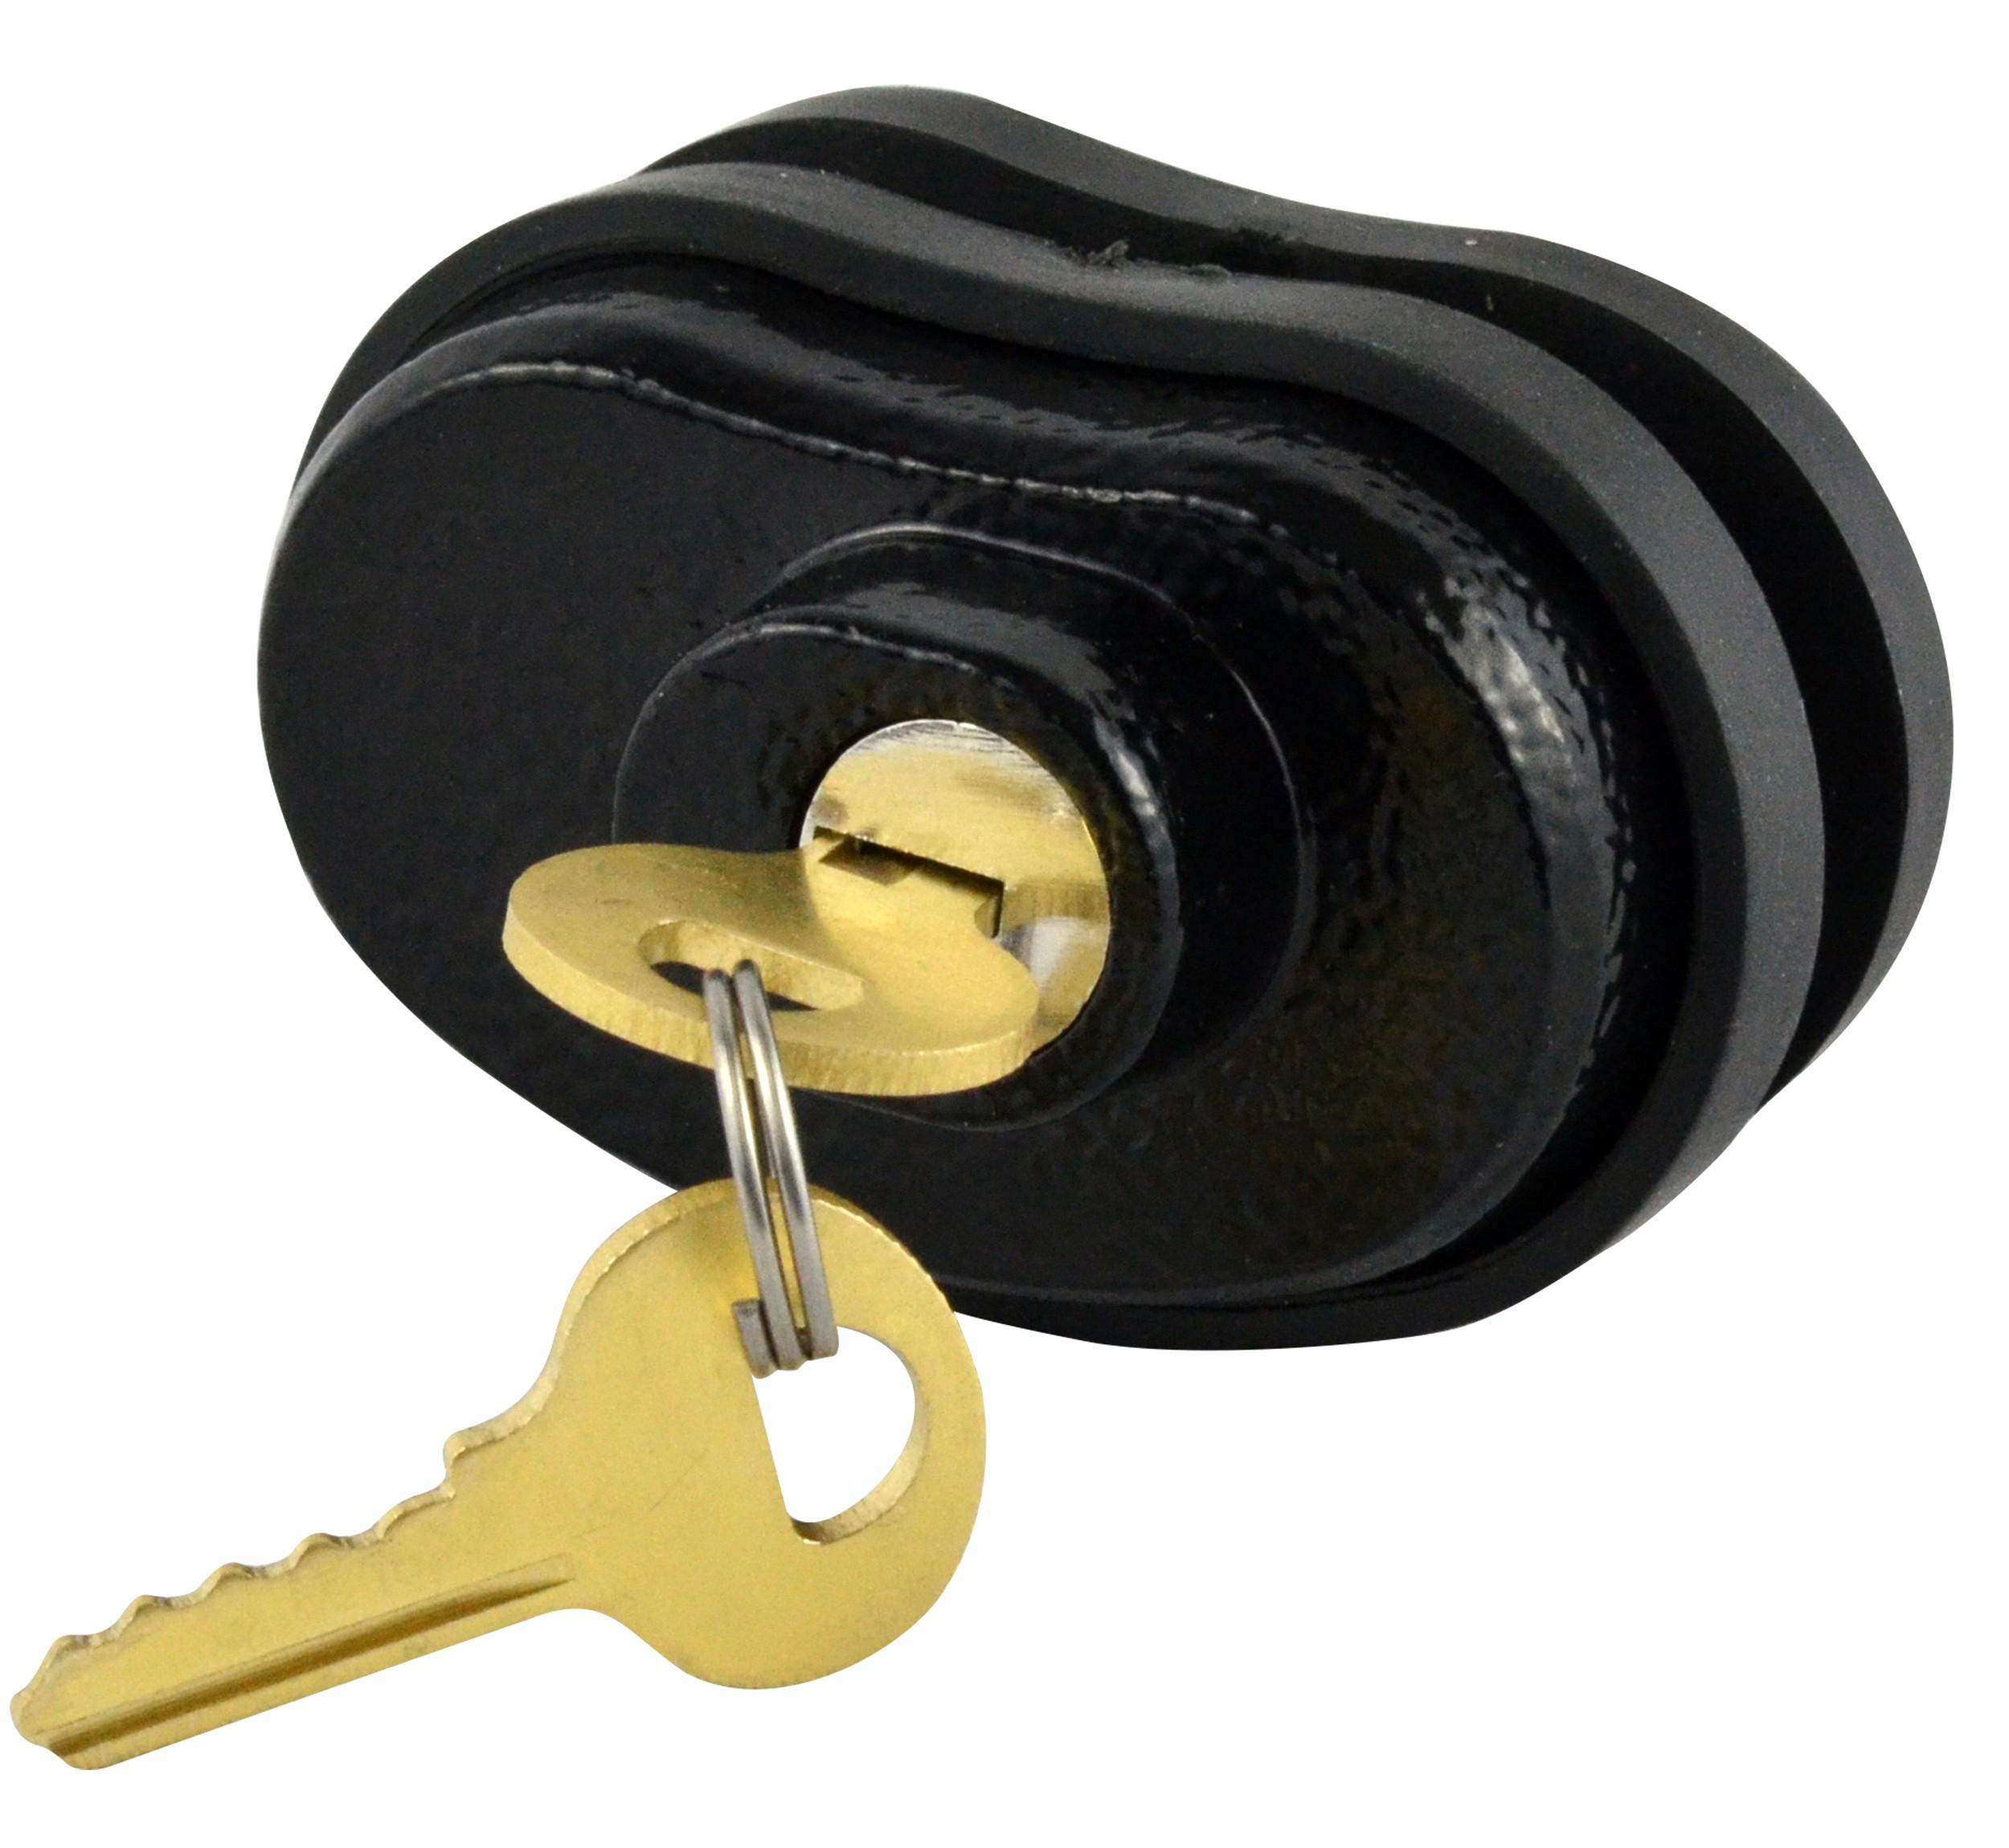 Trigger Gun Lock, Key